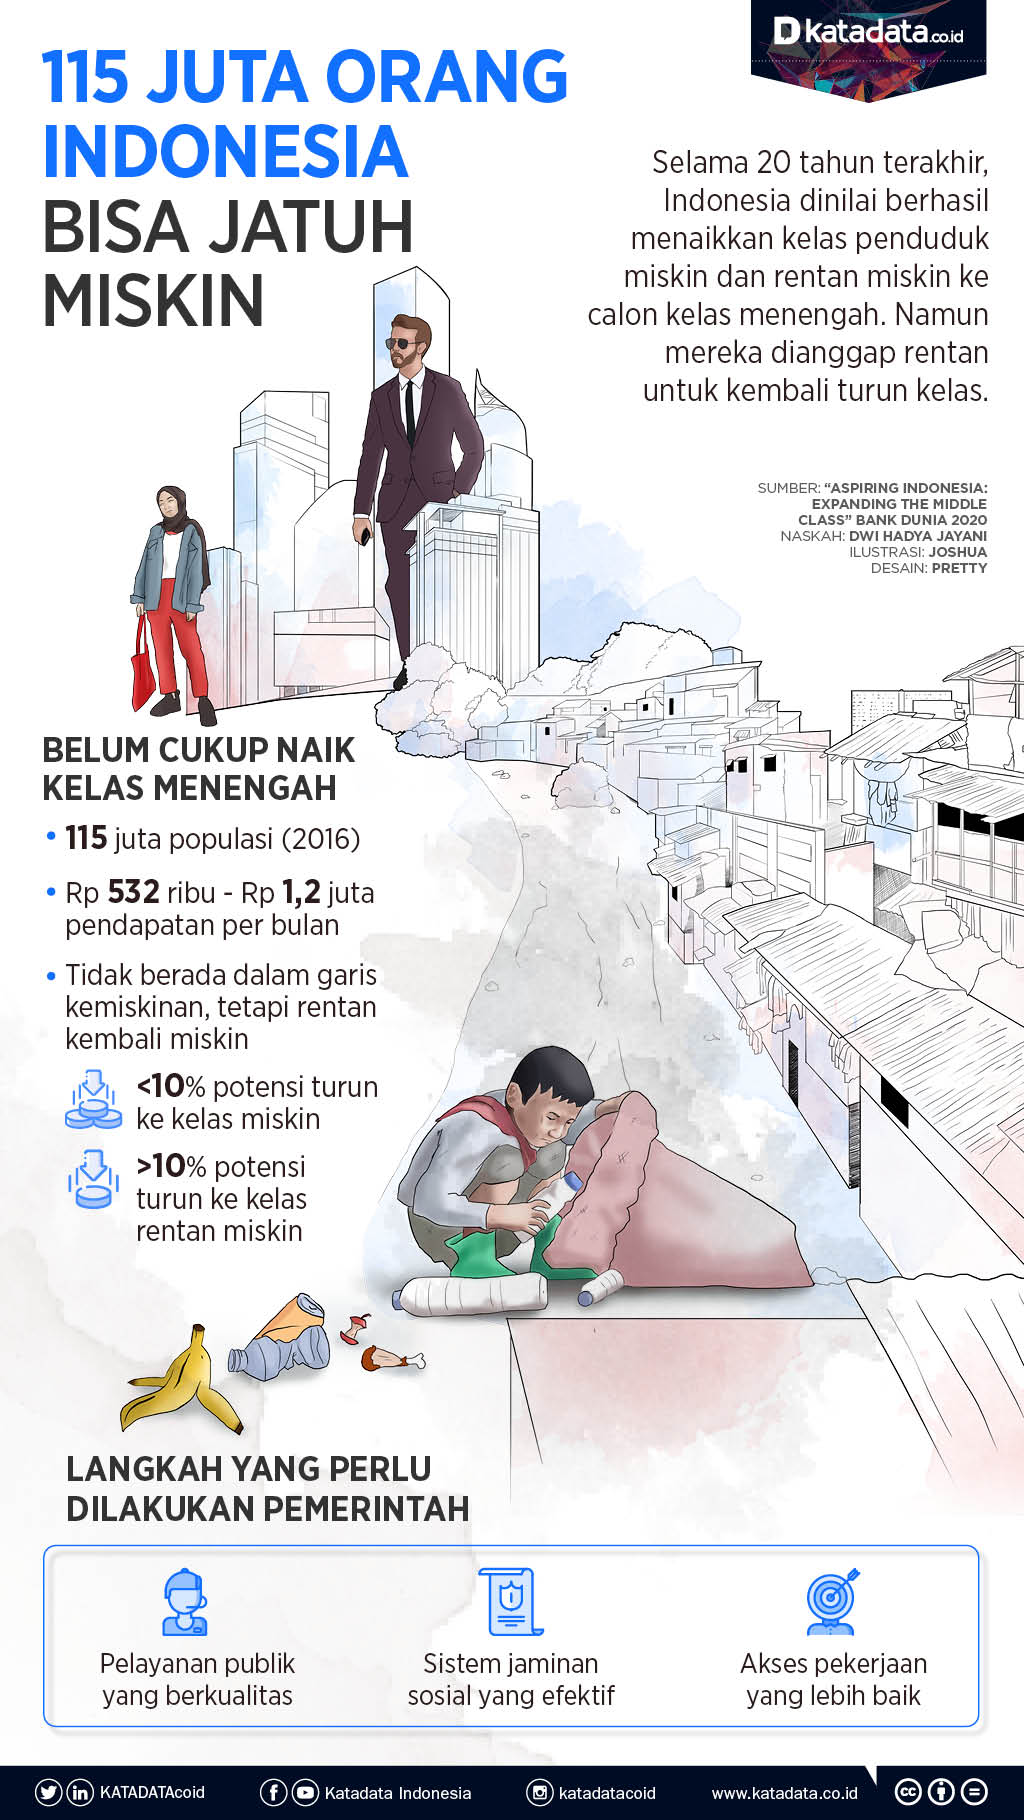 Penduduk miskin bank Dunia